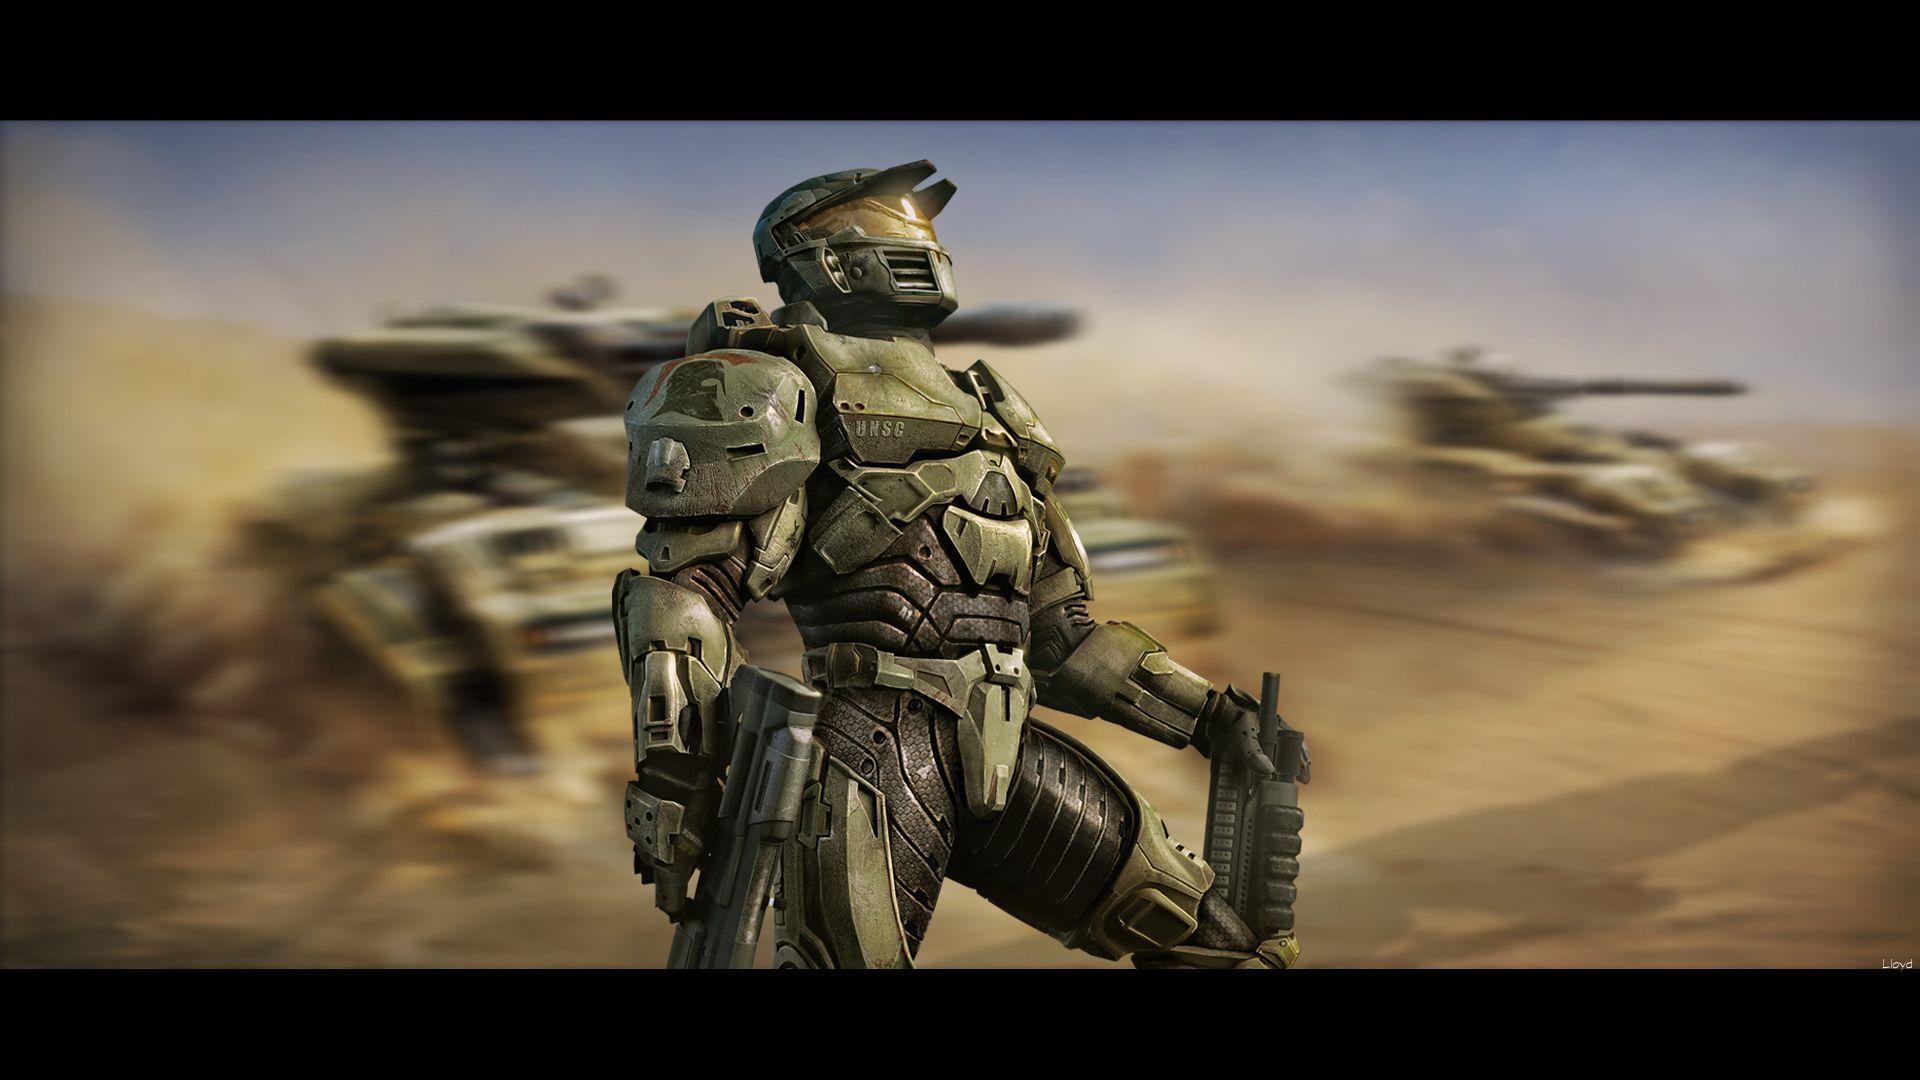 spartan artwork Halo Green Spartan Concept Art HD